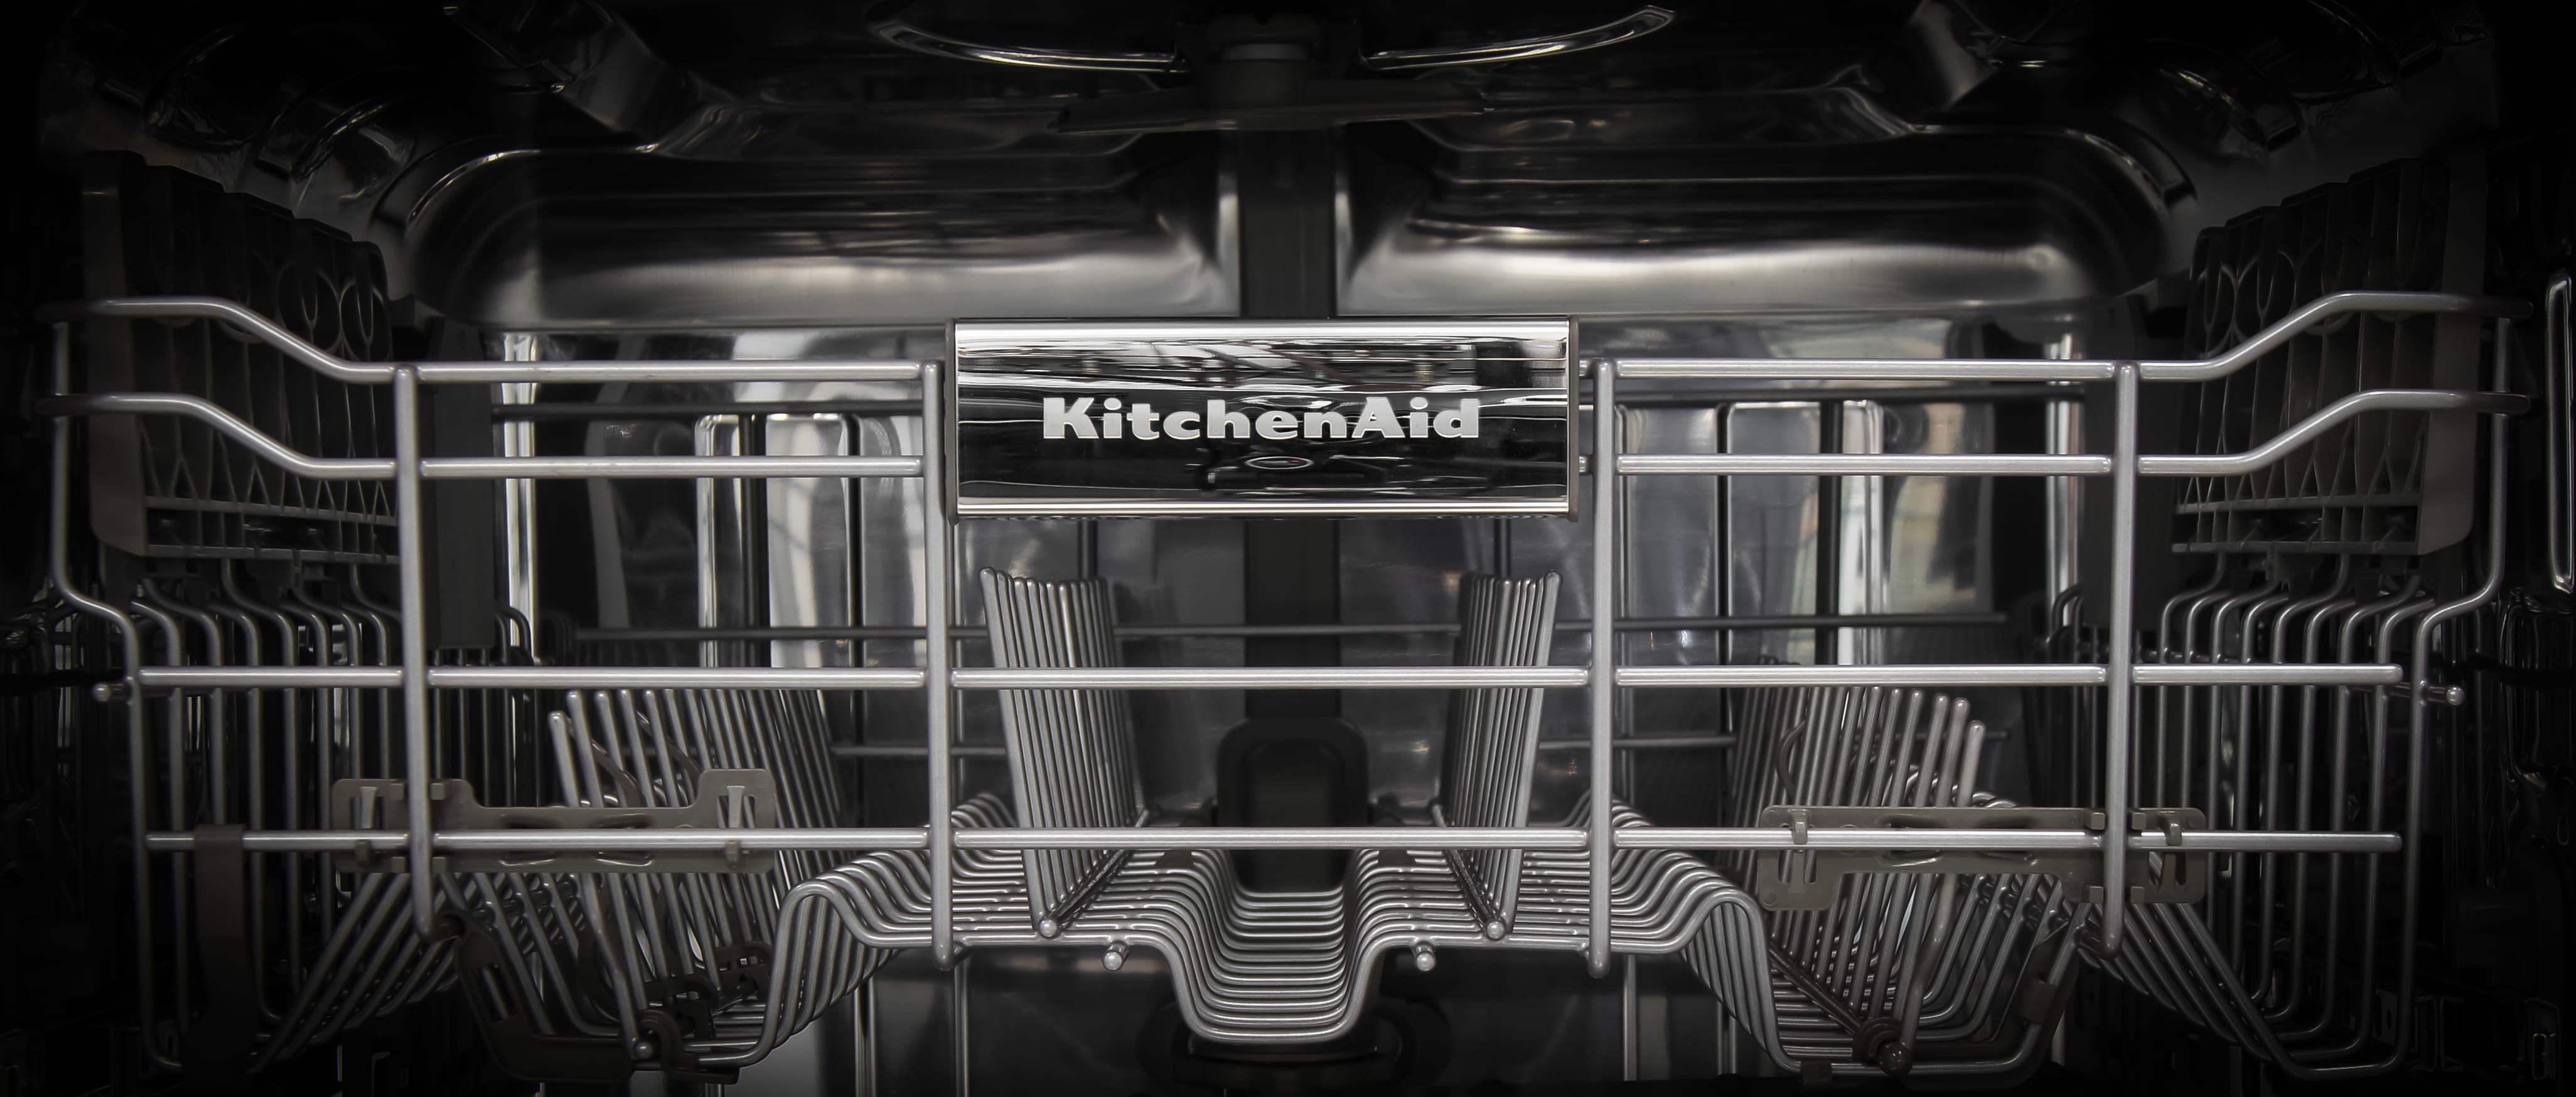 KitchenAid KDTM354DSS